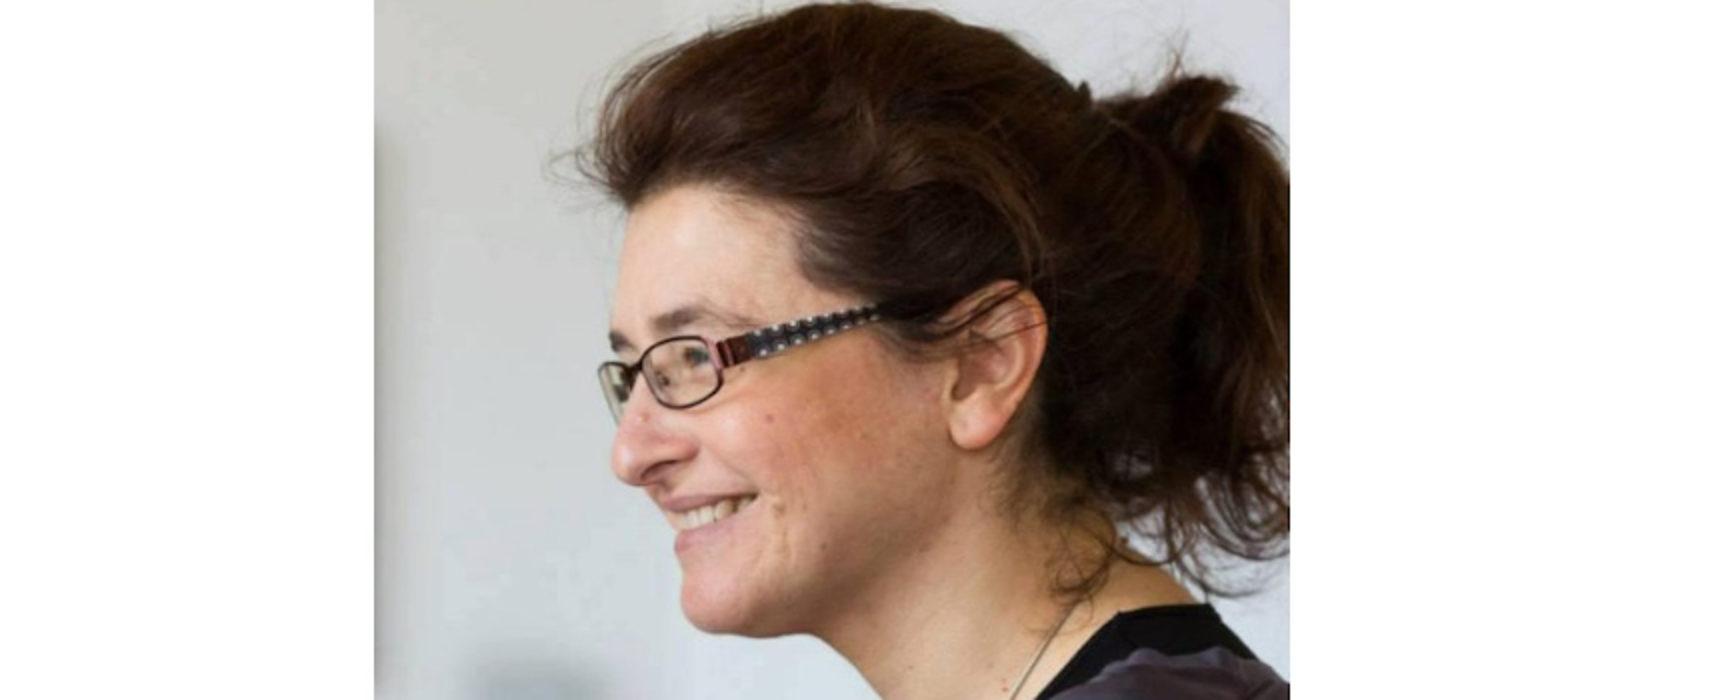 "Cristina Bellemo ospite di ""Consigli d'Autore"" / DIRETTA FACEBOOK sulla pagina di Bisceglie24"